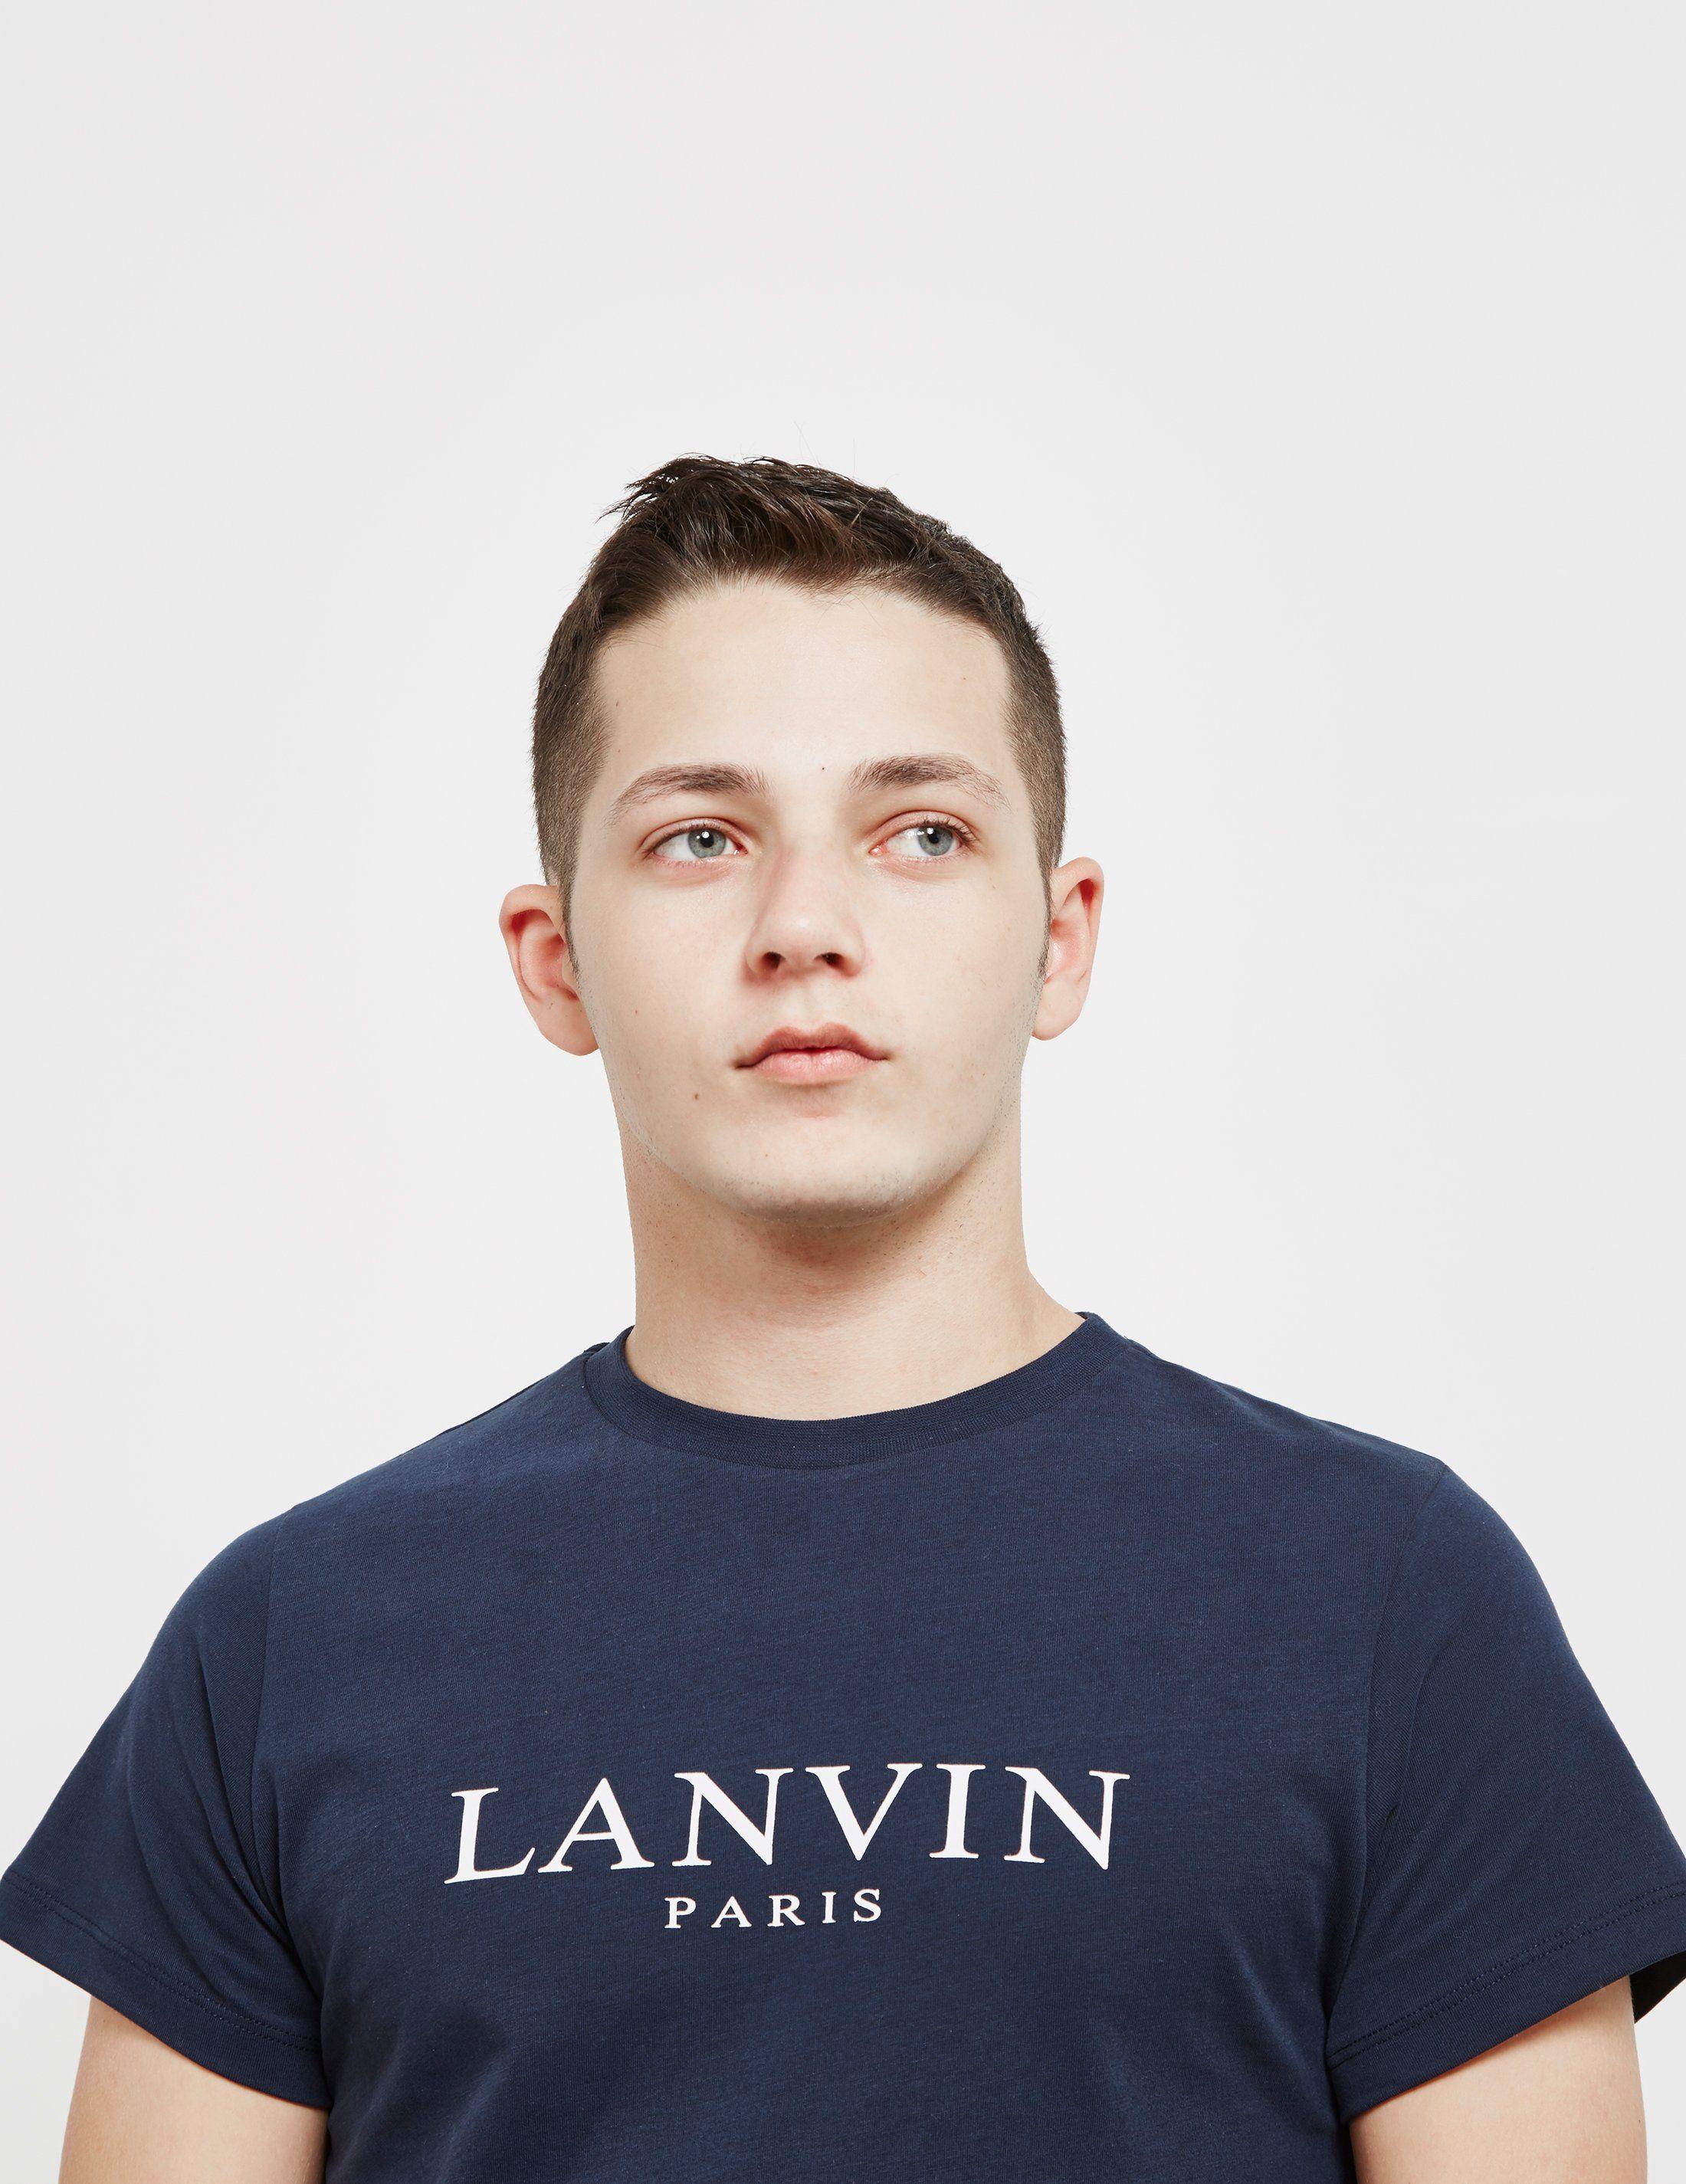 Lanvin Classic Logo Short Sleeve T-Shirt